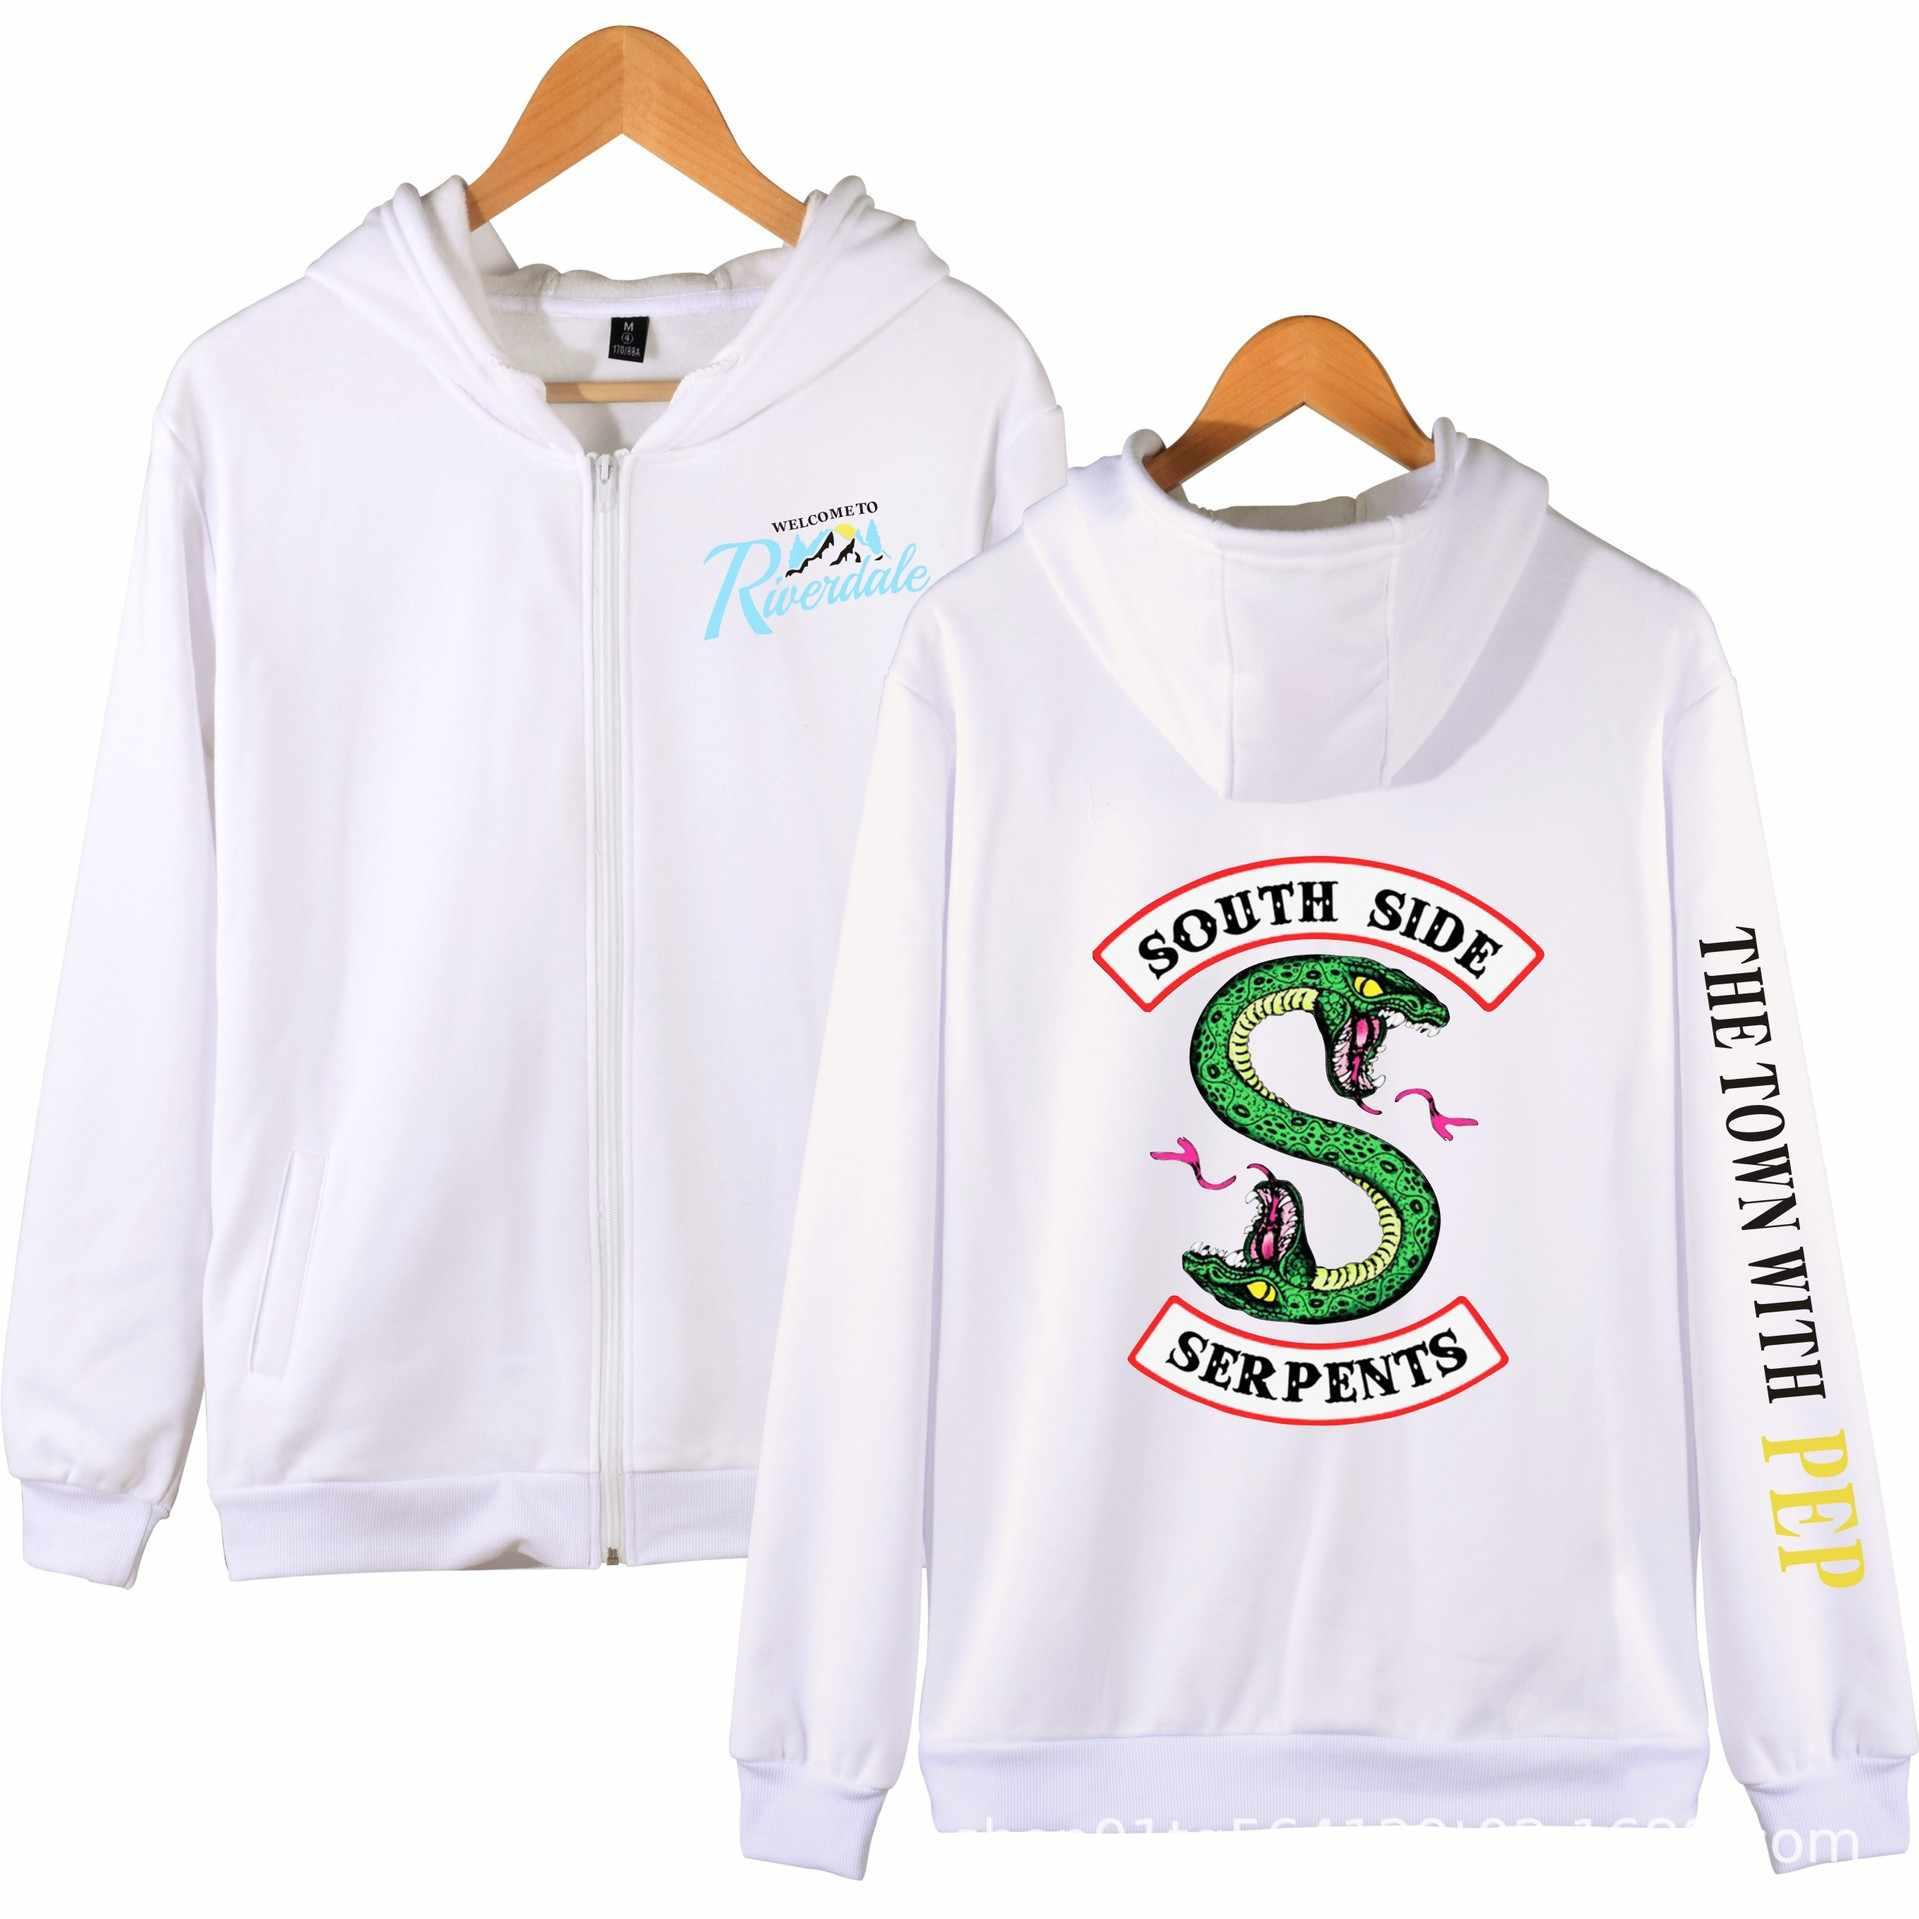 New Southside Riverdale Serpents Jacket Coats Fashion Zipper Hooded Sweatshirts Men Long Sleeve Hoodies Hip Hop Streetwear 4XL